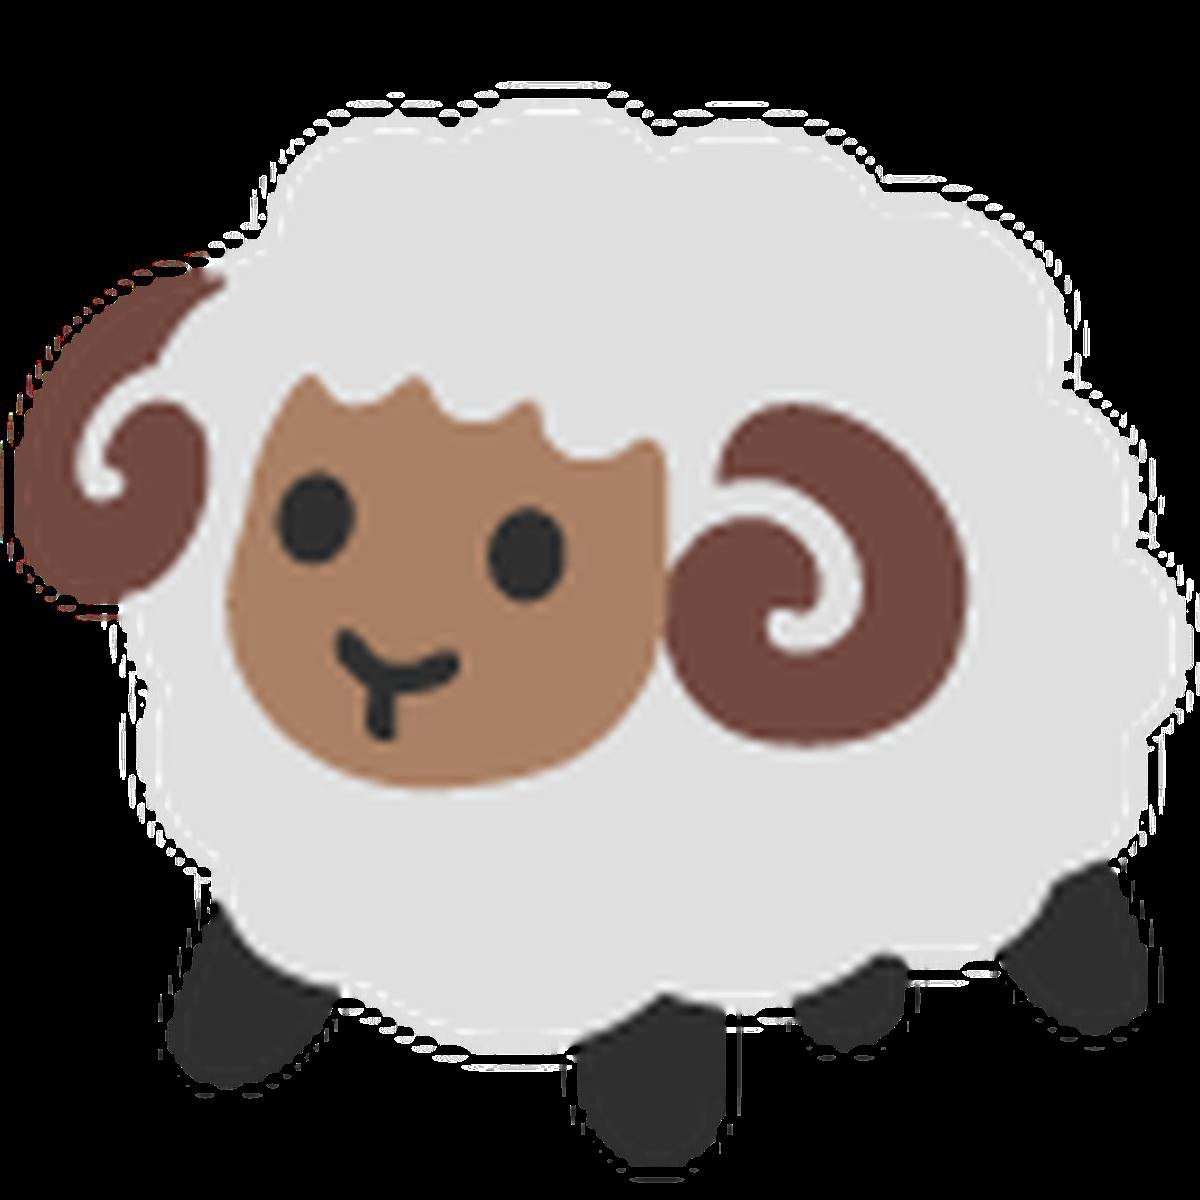 Haircut clipart sheep. A closer look at